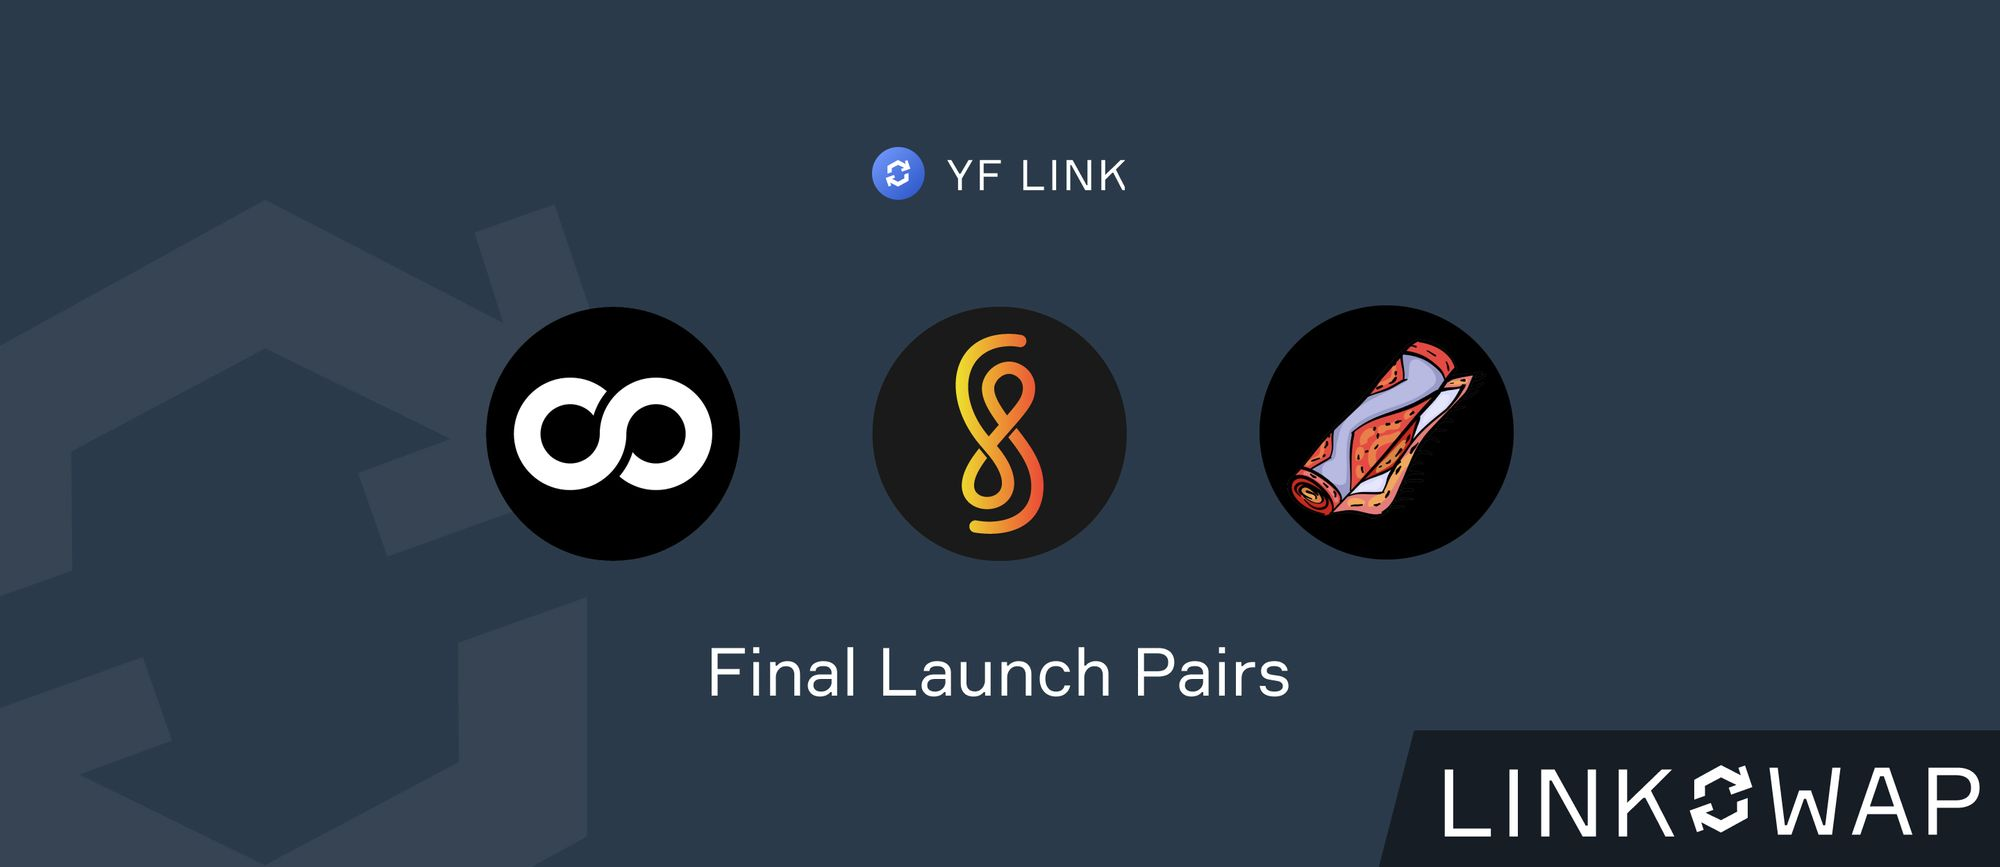 LINKSWAP Launch Pairs Announcement